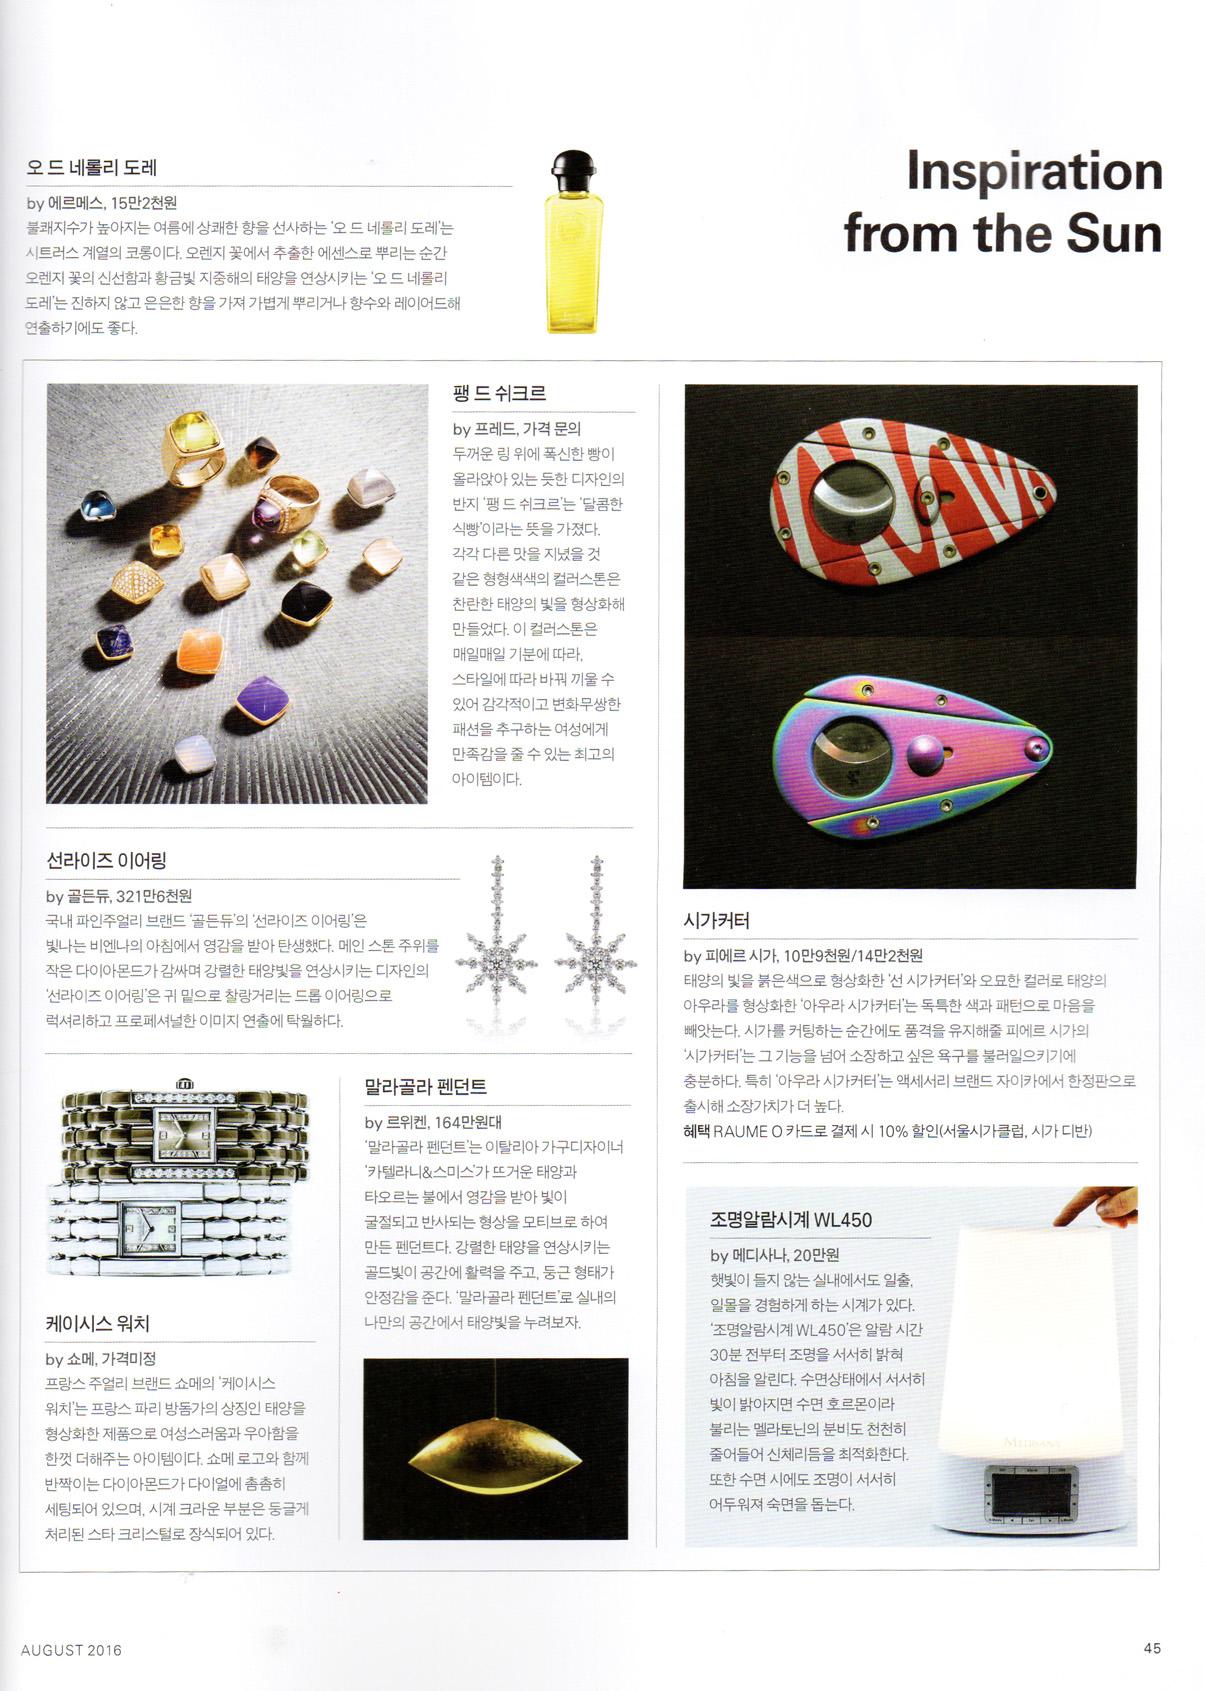 2016-8 Raume article.jpg